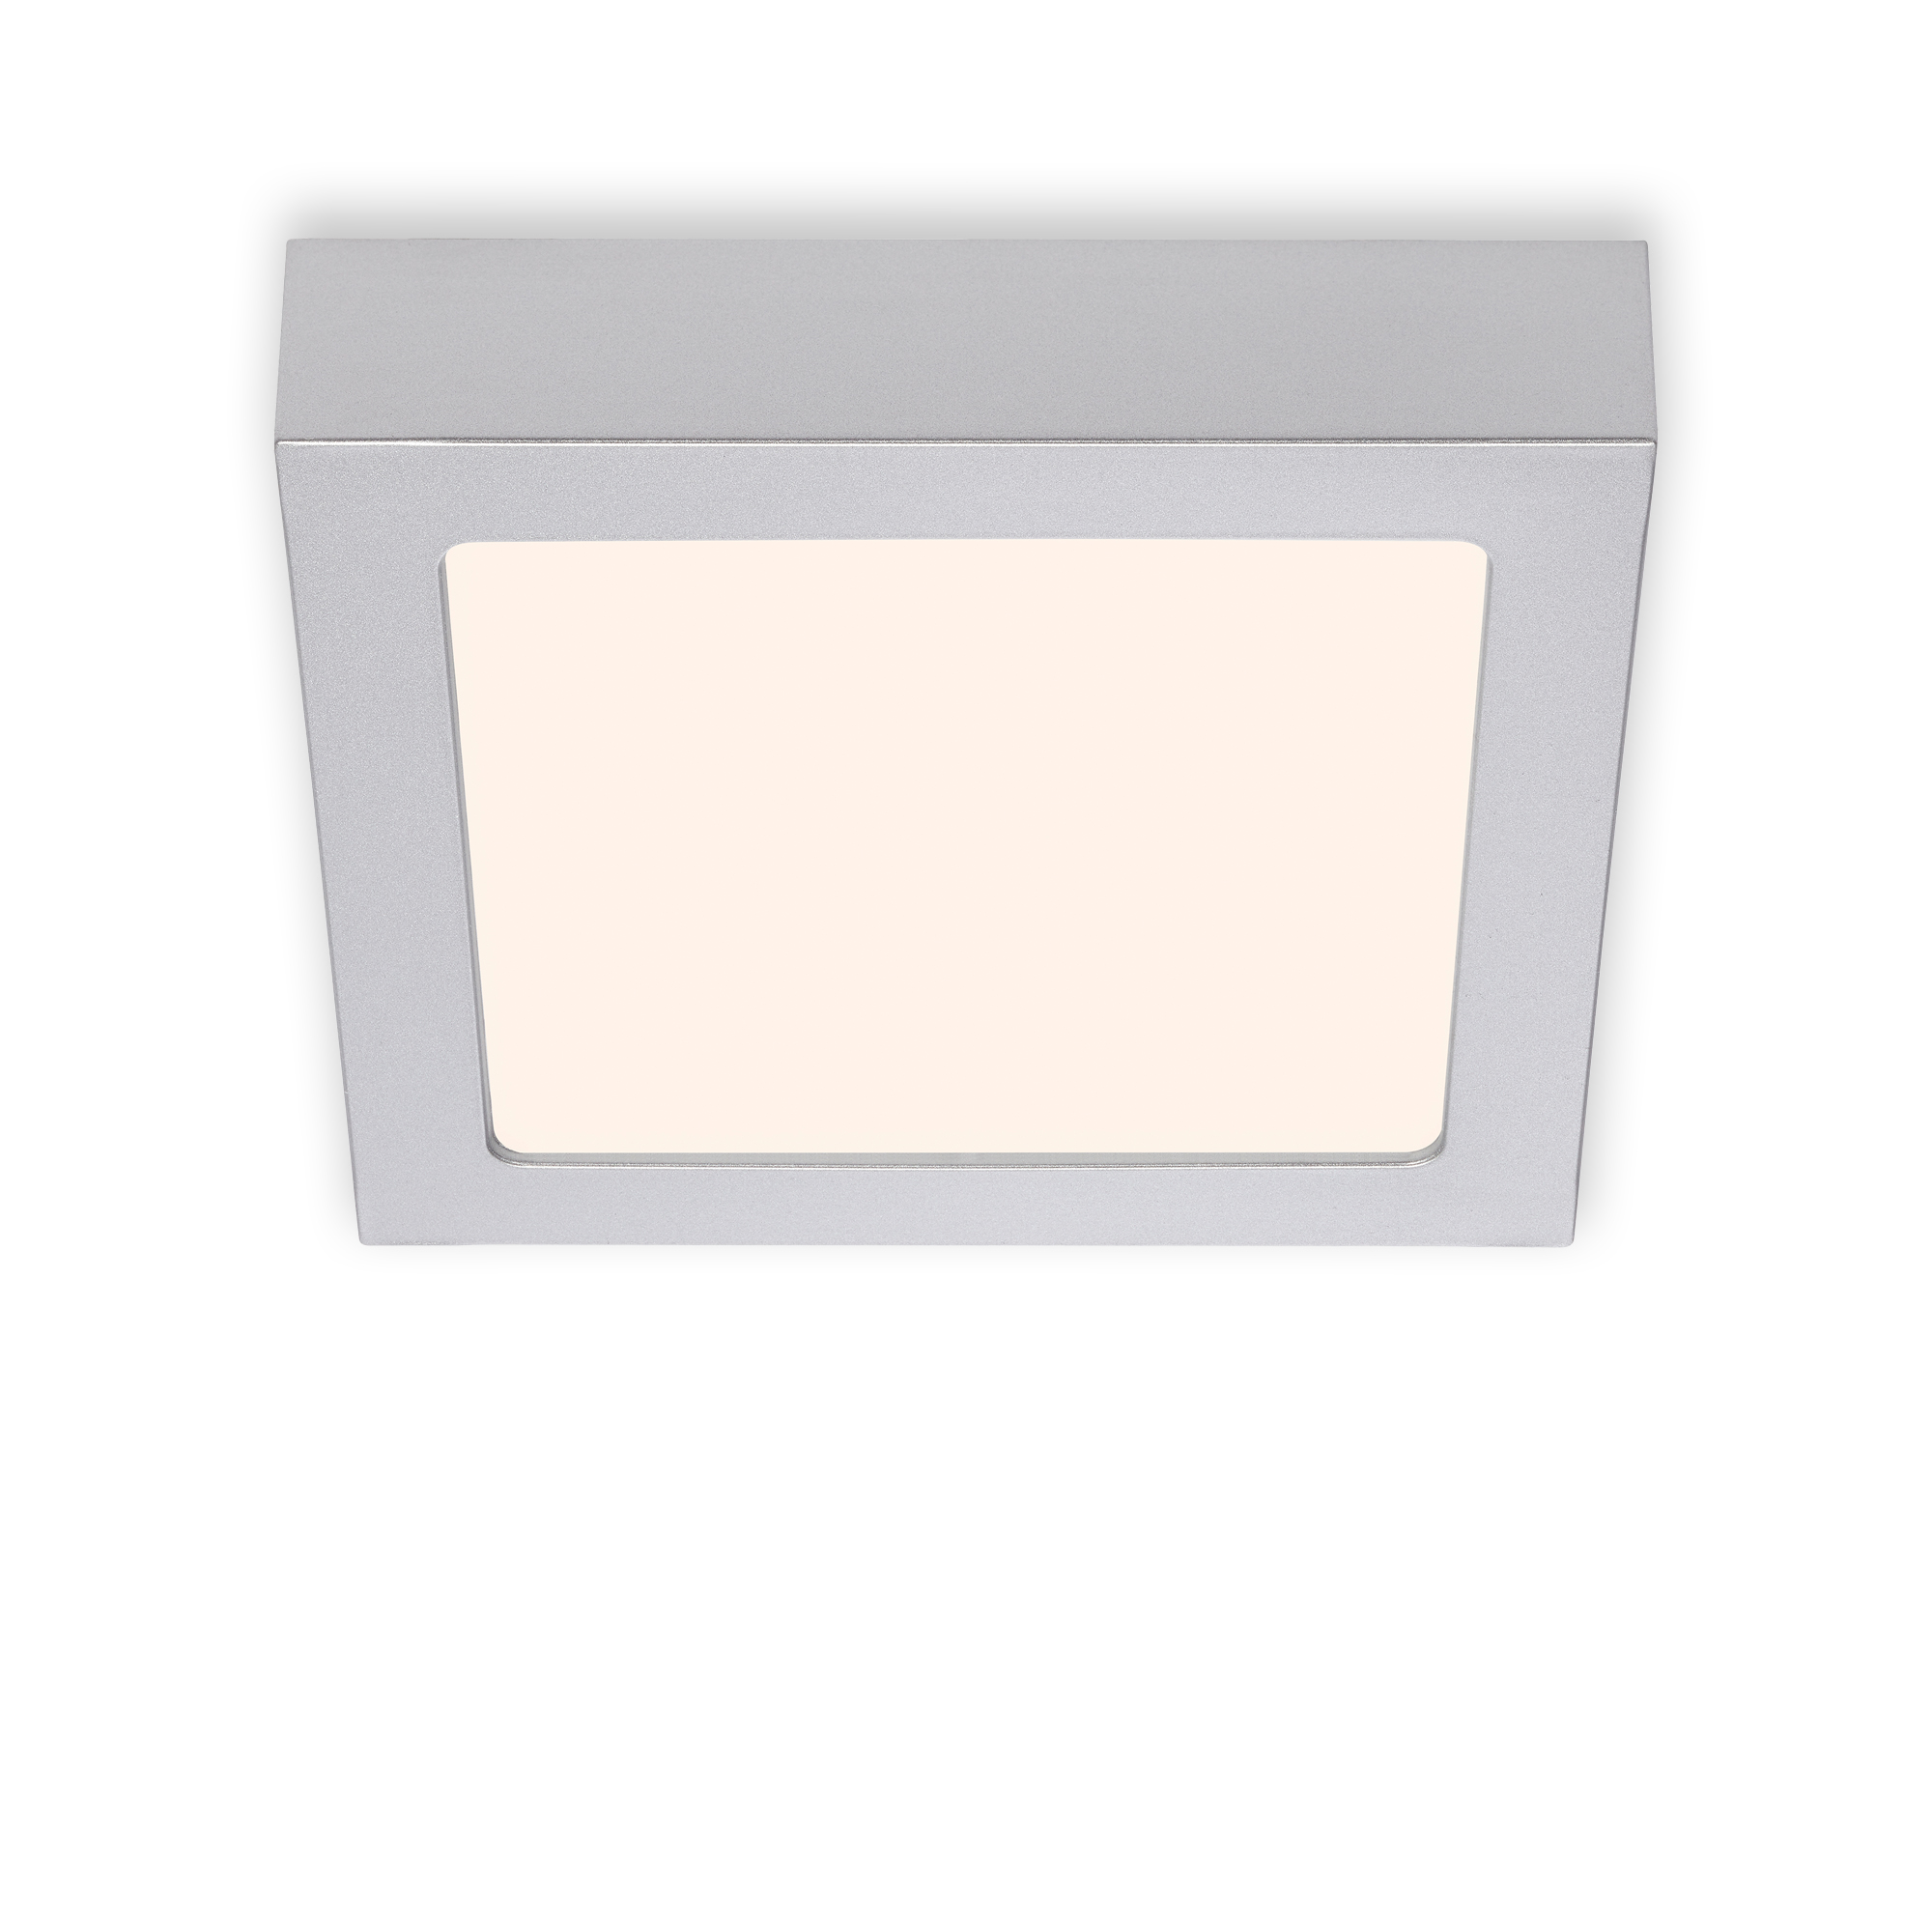 LED Deckenleuchte, 17 cm, 12 W, Chrom-Matt